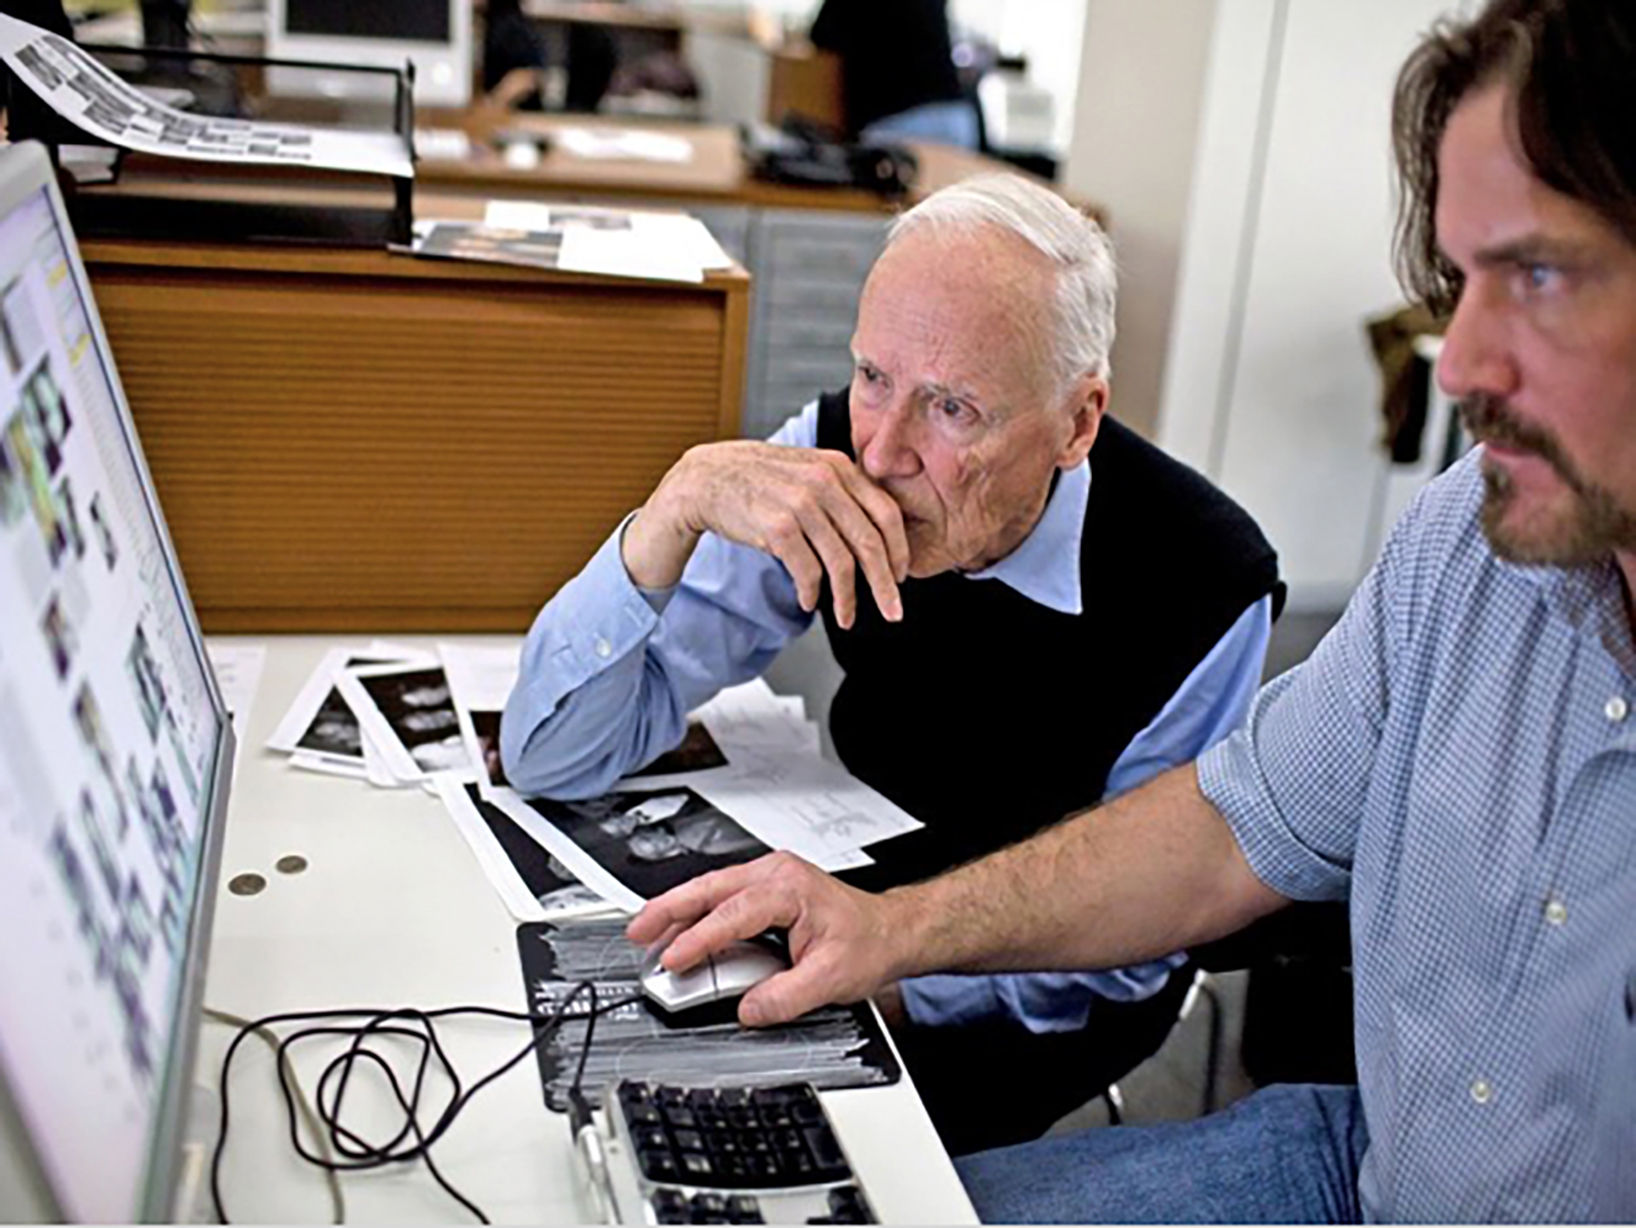 Bill Cunningham and John Kurdewan at work at The New York Times.